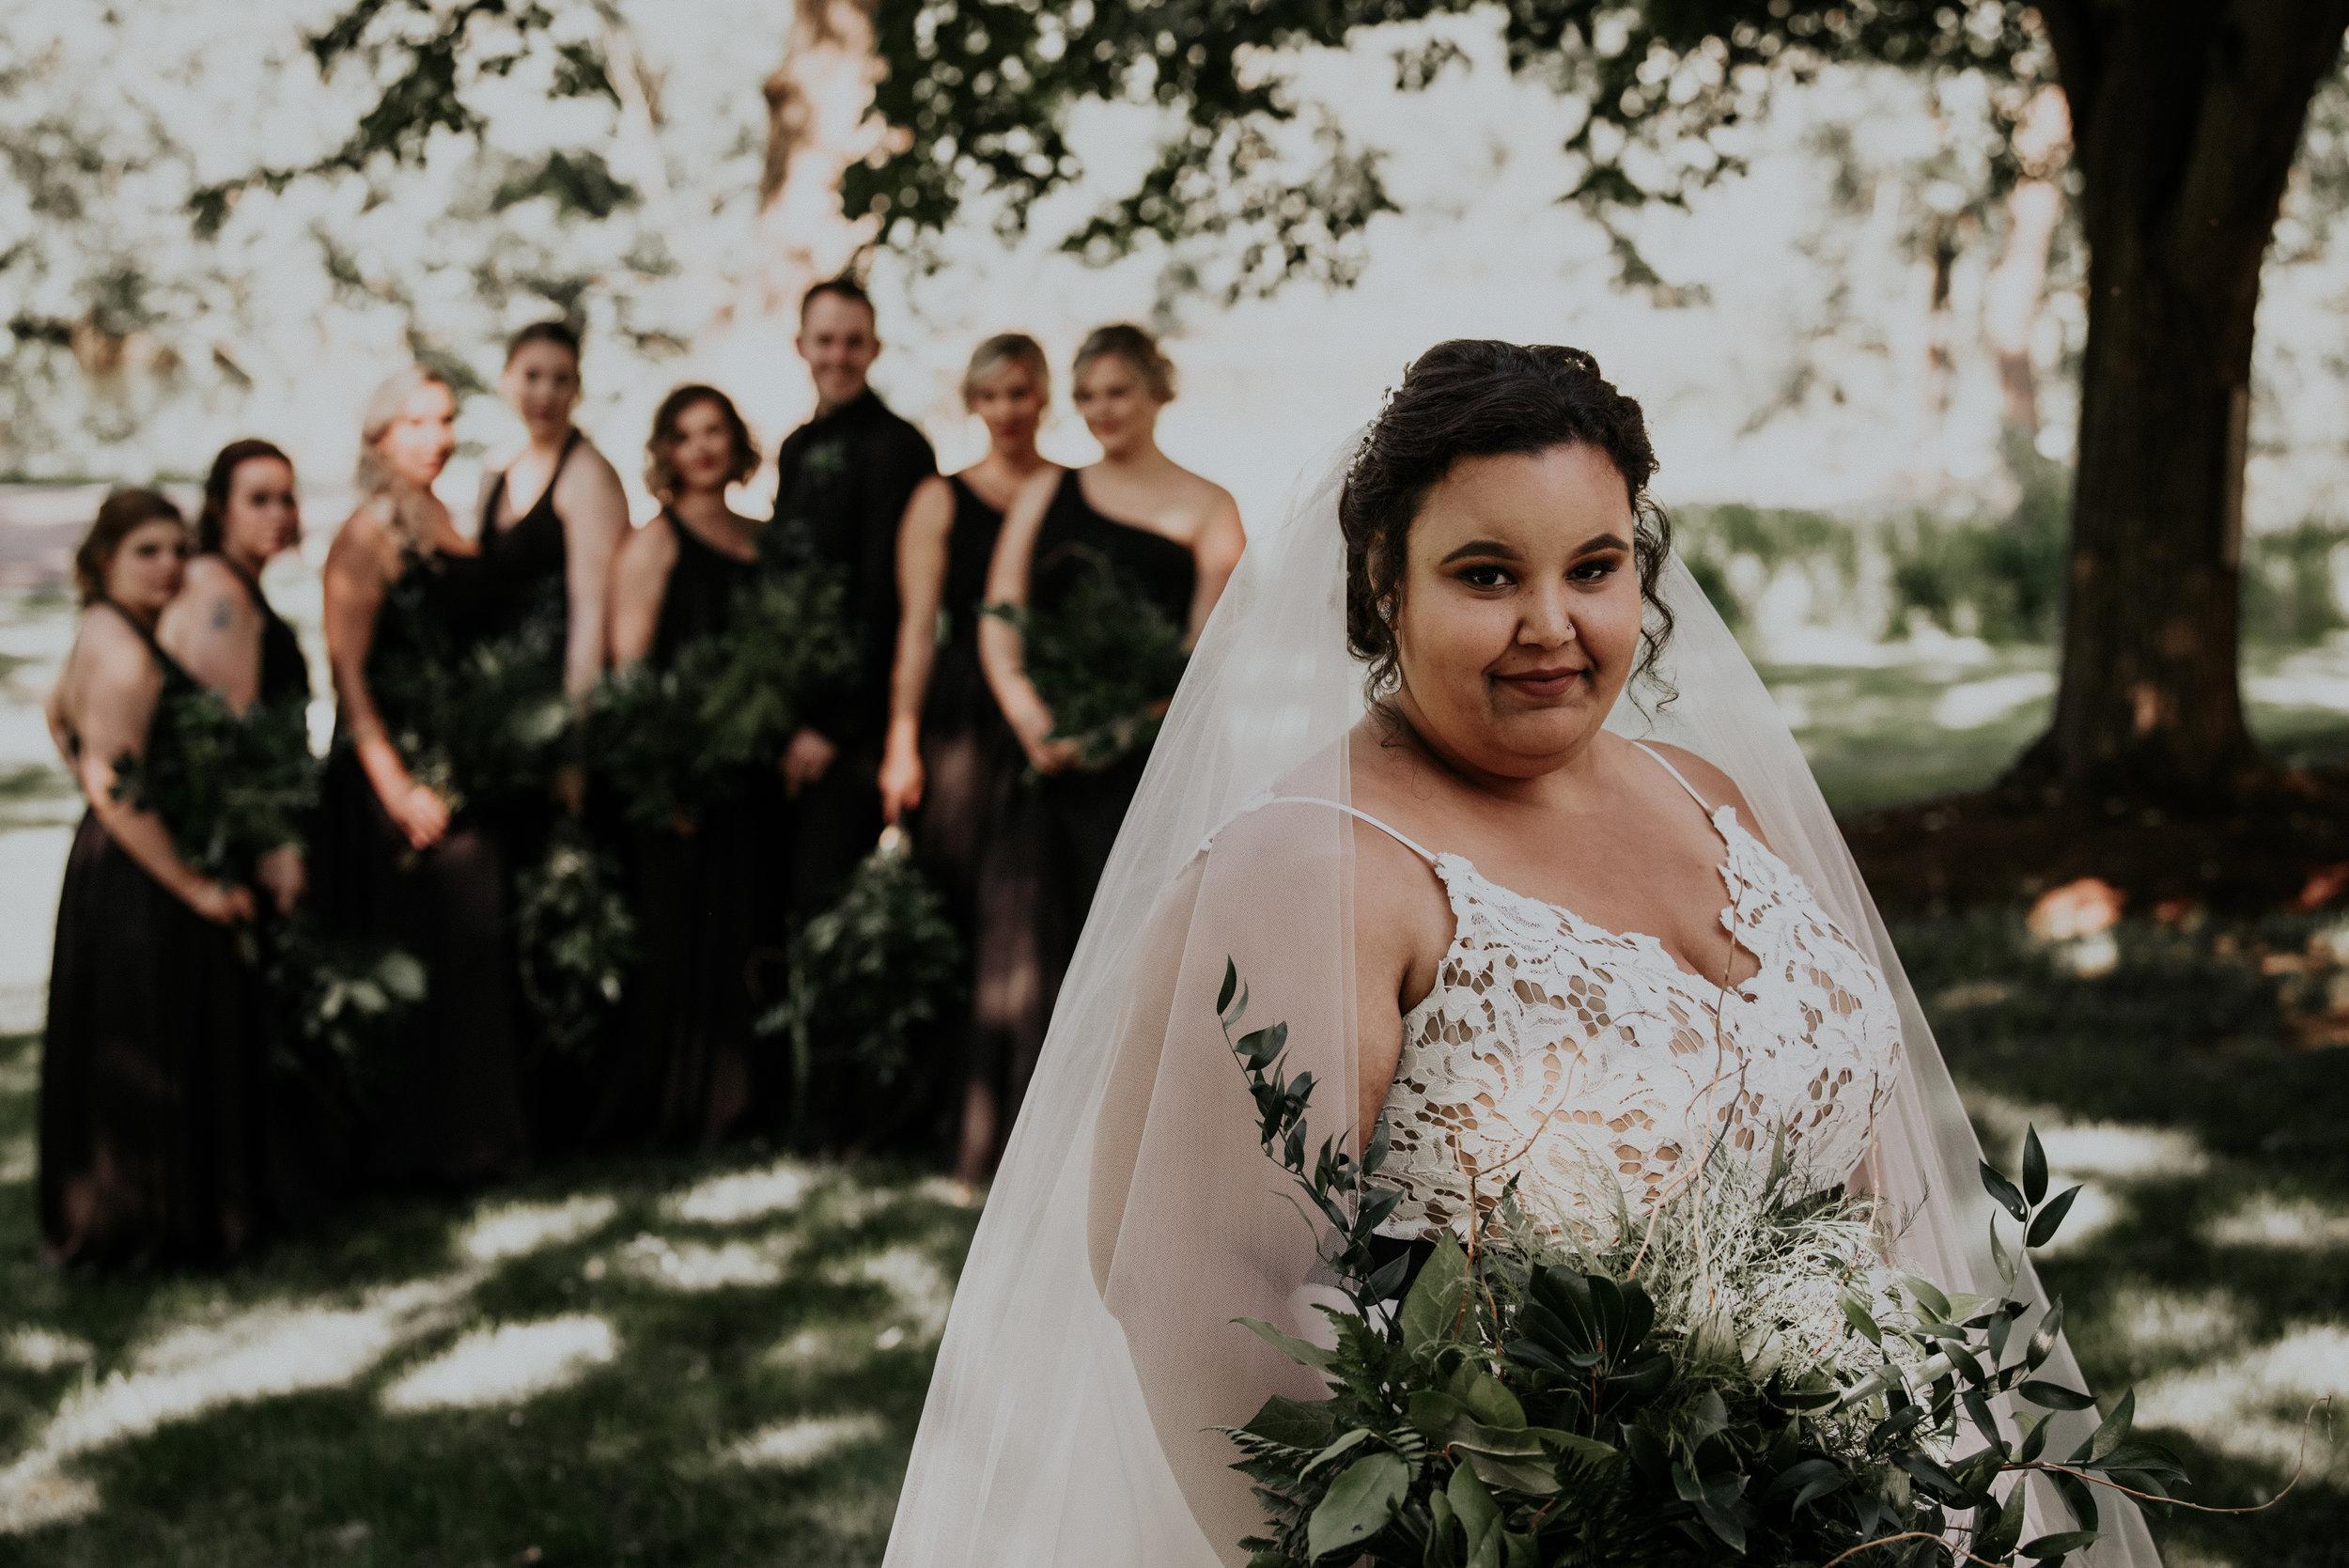 BridesbyYoung-RealWedding-PlusSizeBridal-BillyCourtney-JurassicParkTheme-35.jpg